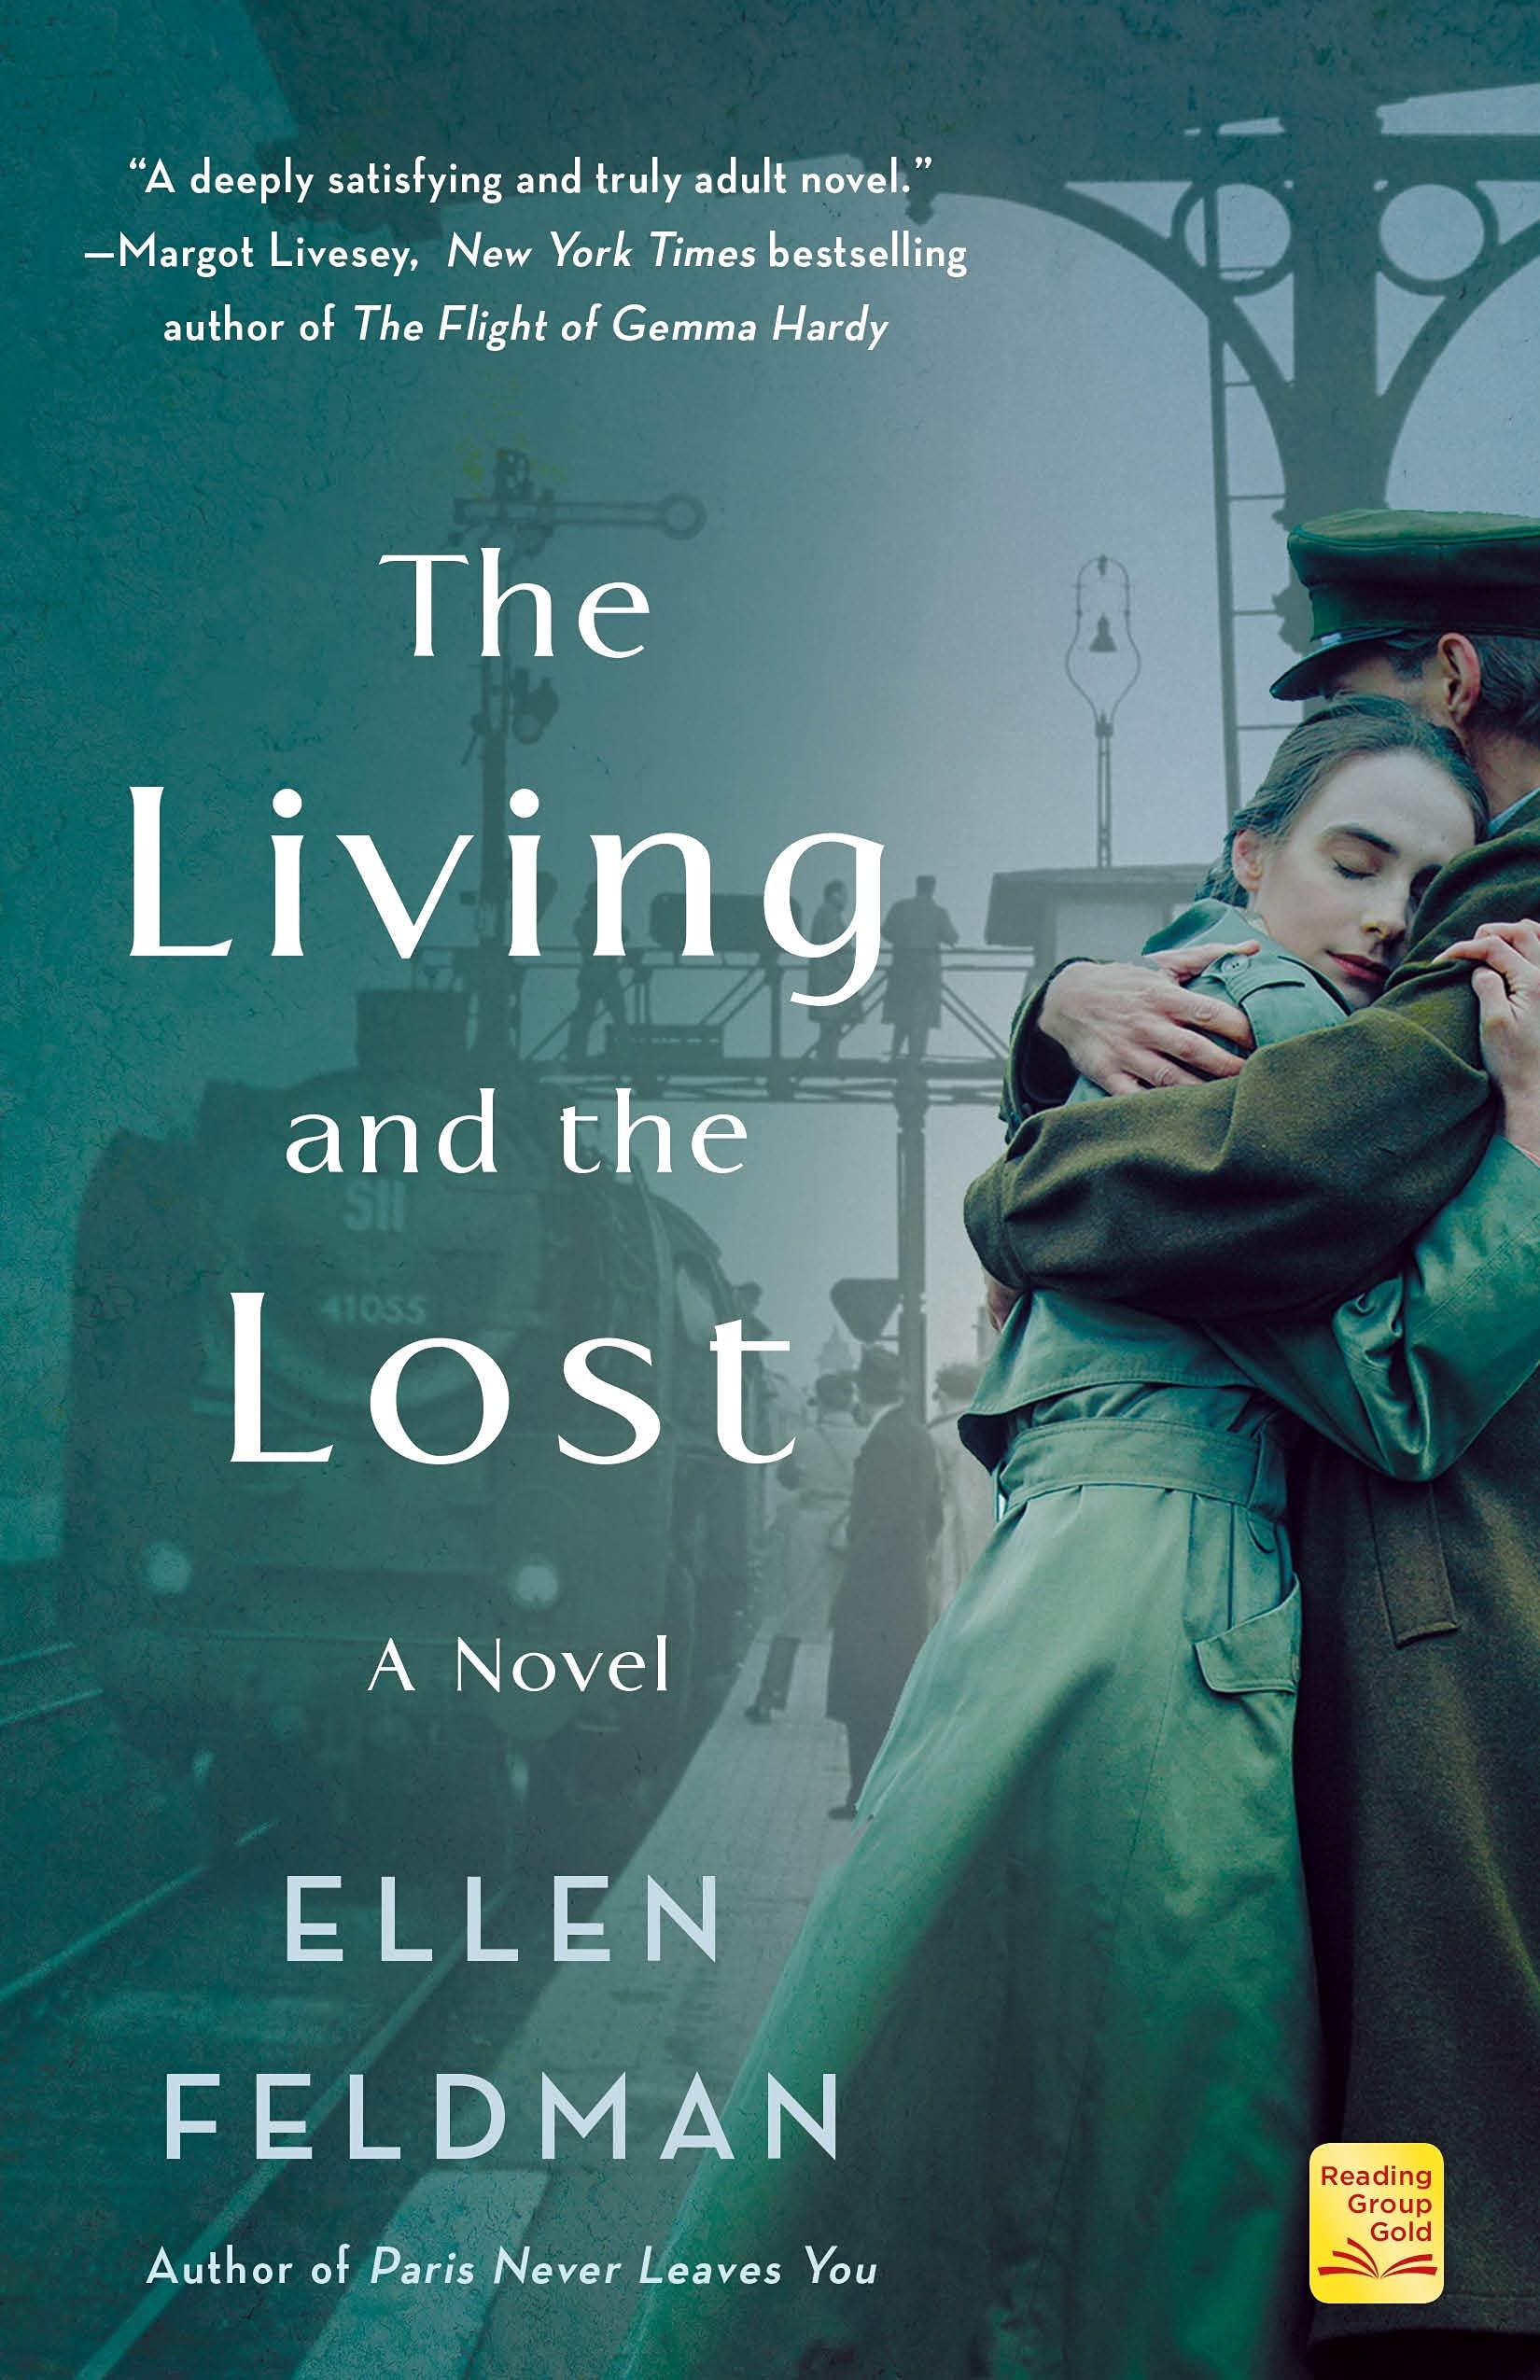 Amazon.com: The Living and the Lost: A Novel: 9781250821812: Feldman,  Ellen: Books